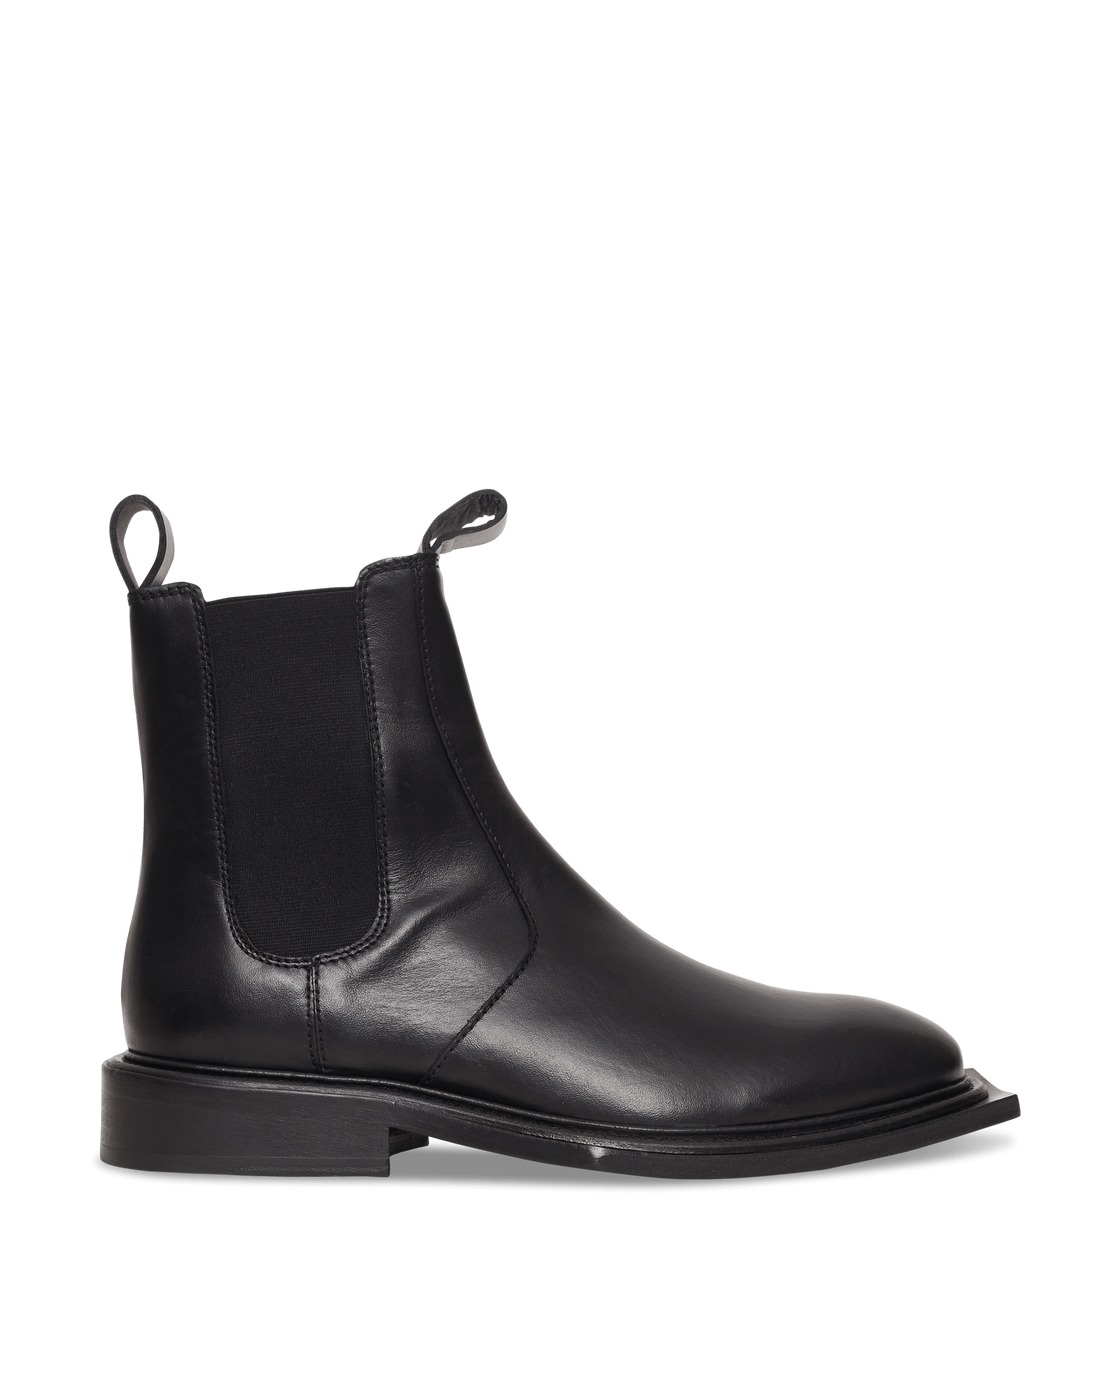 Martine Rose Hacienda Leather Boots Black/Black